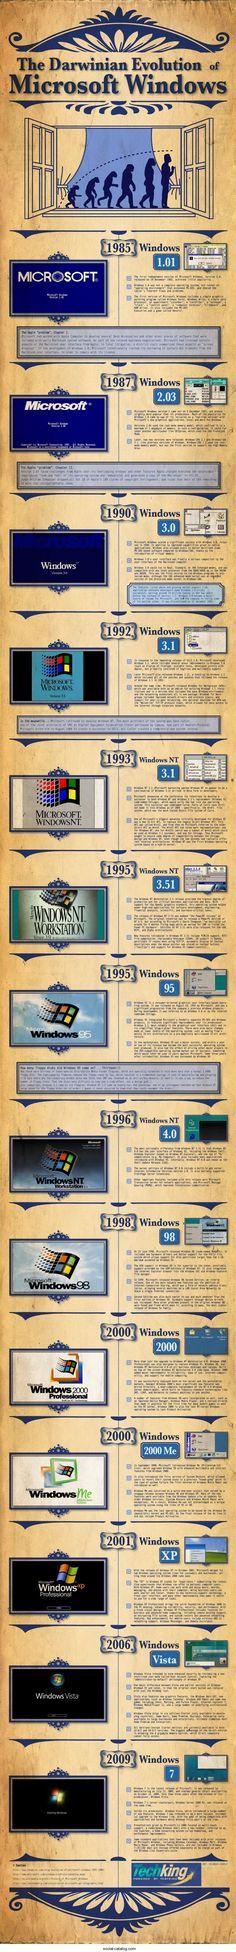 The Darwinian Evolution Of Microsoft Windows [INFOGRAPHIC]